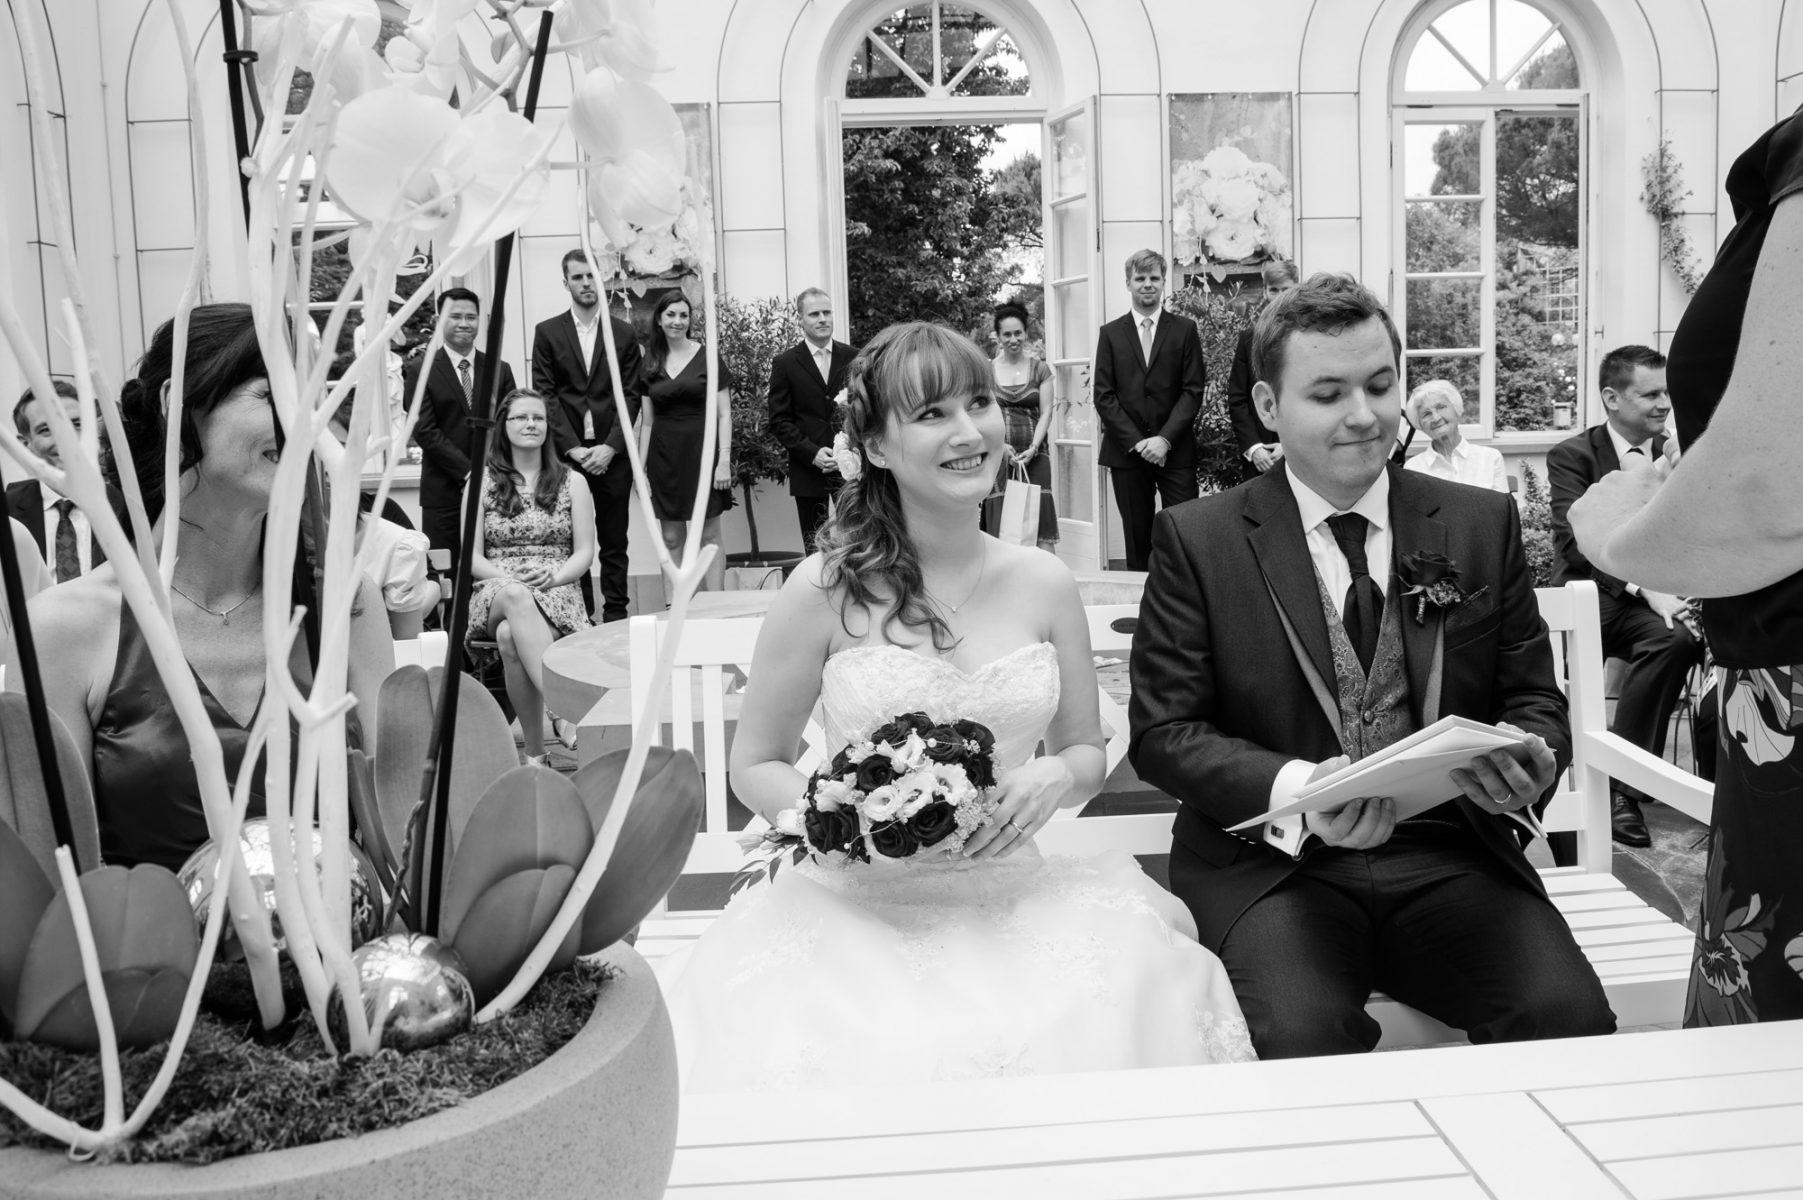 Hochzeit Feier  B2000 2898 1803x1200 - Trauung